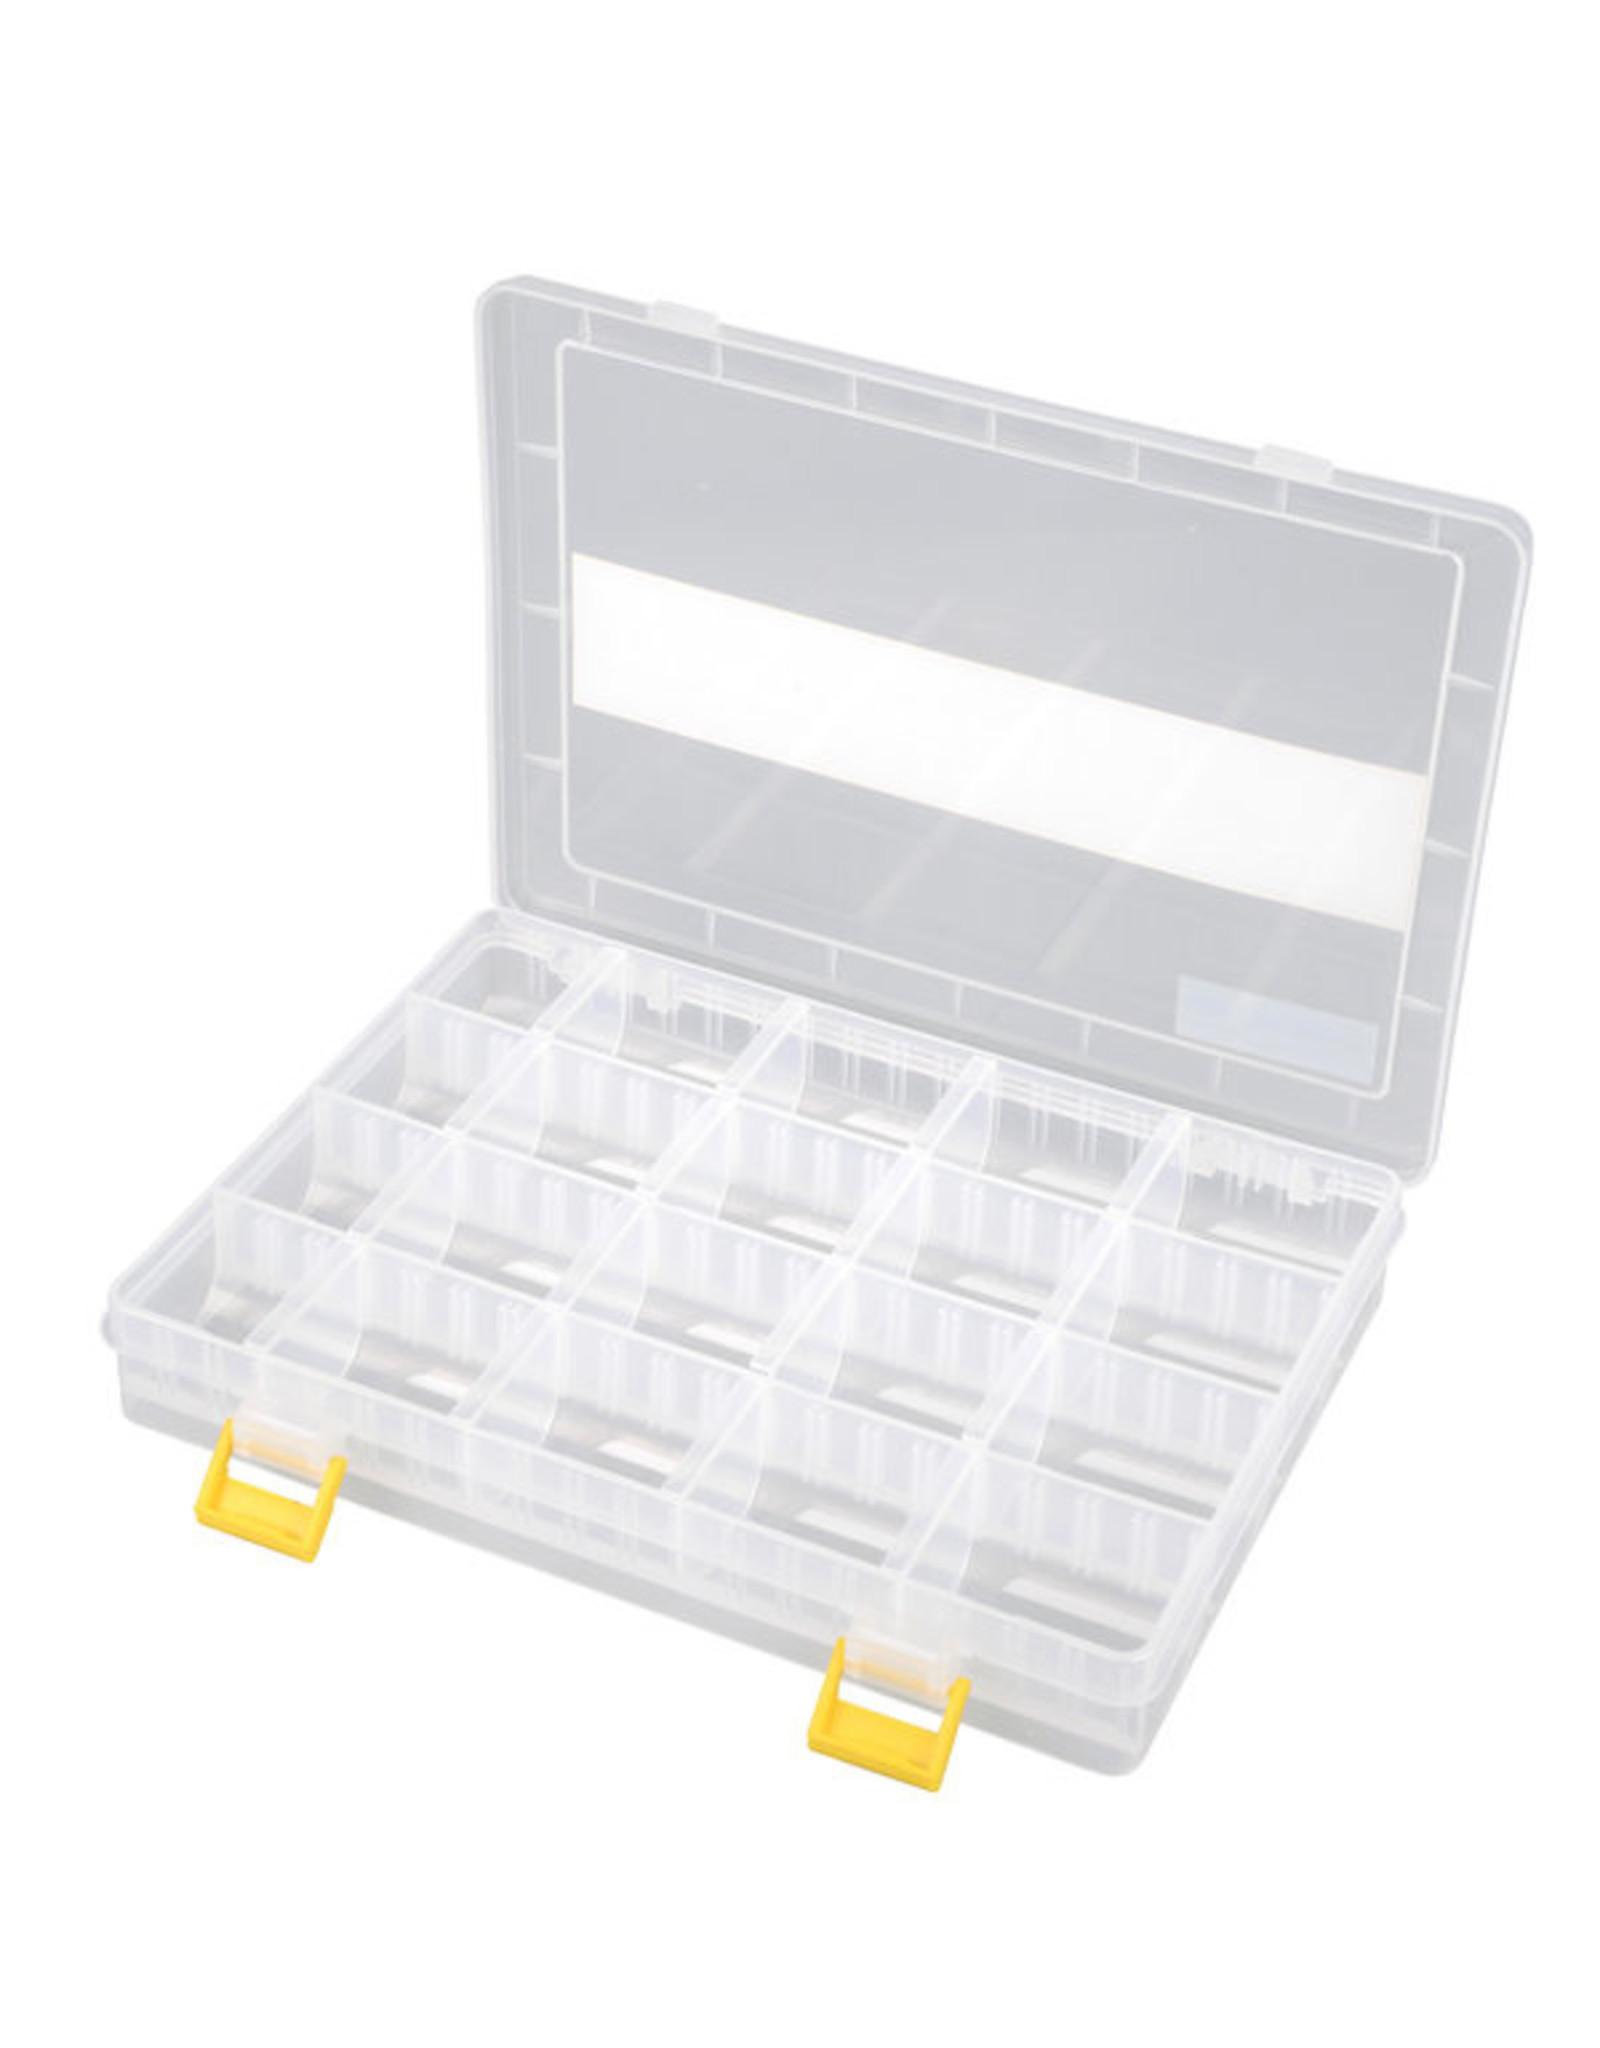 SPRO Tackle Box 600